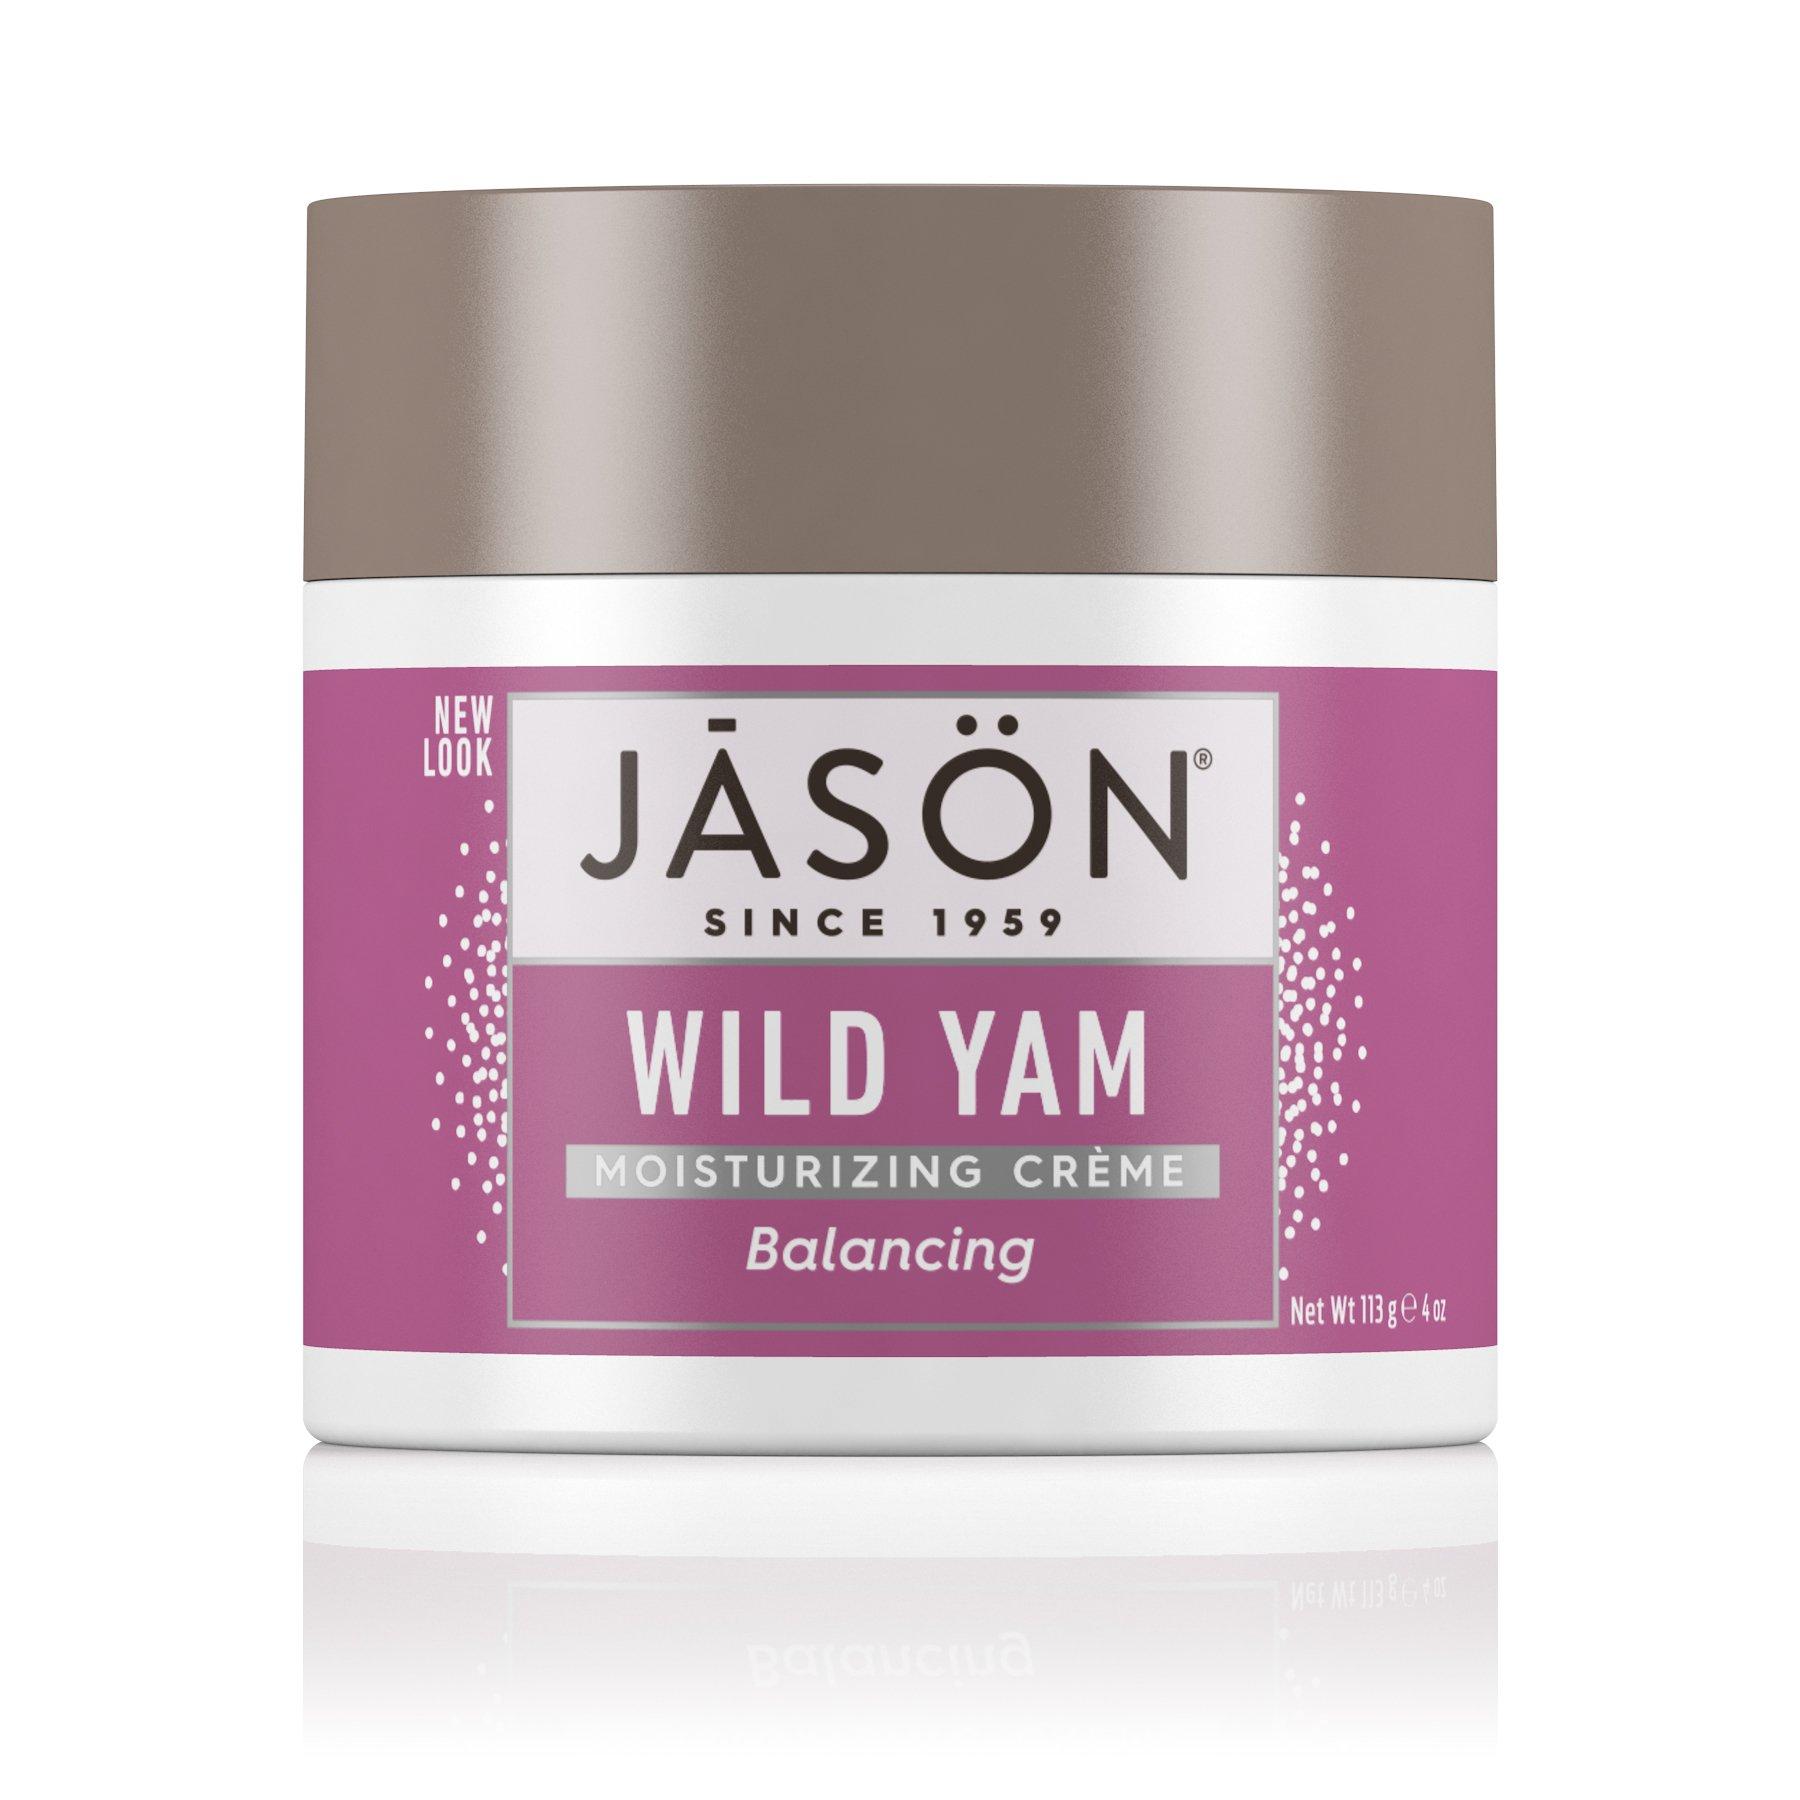 JASON Balancing Wild Yam Moisturizing Crème, 4 oz. (Packaging May Vary)